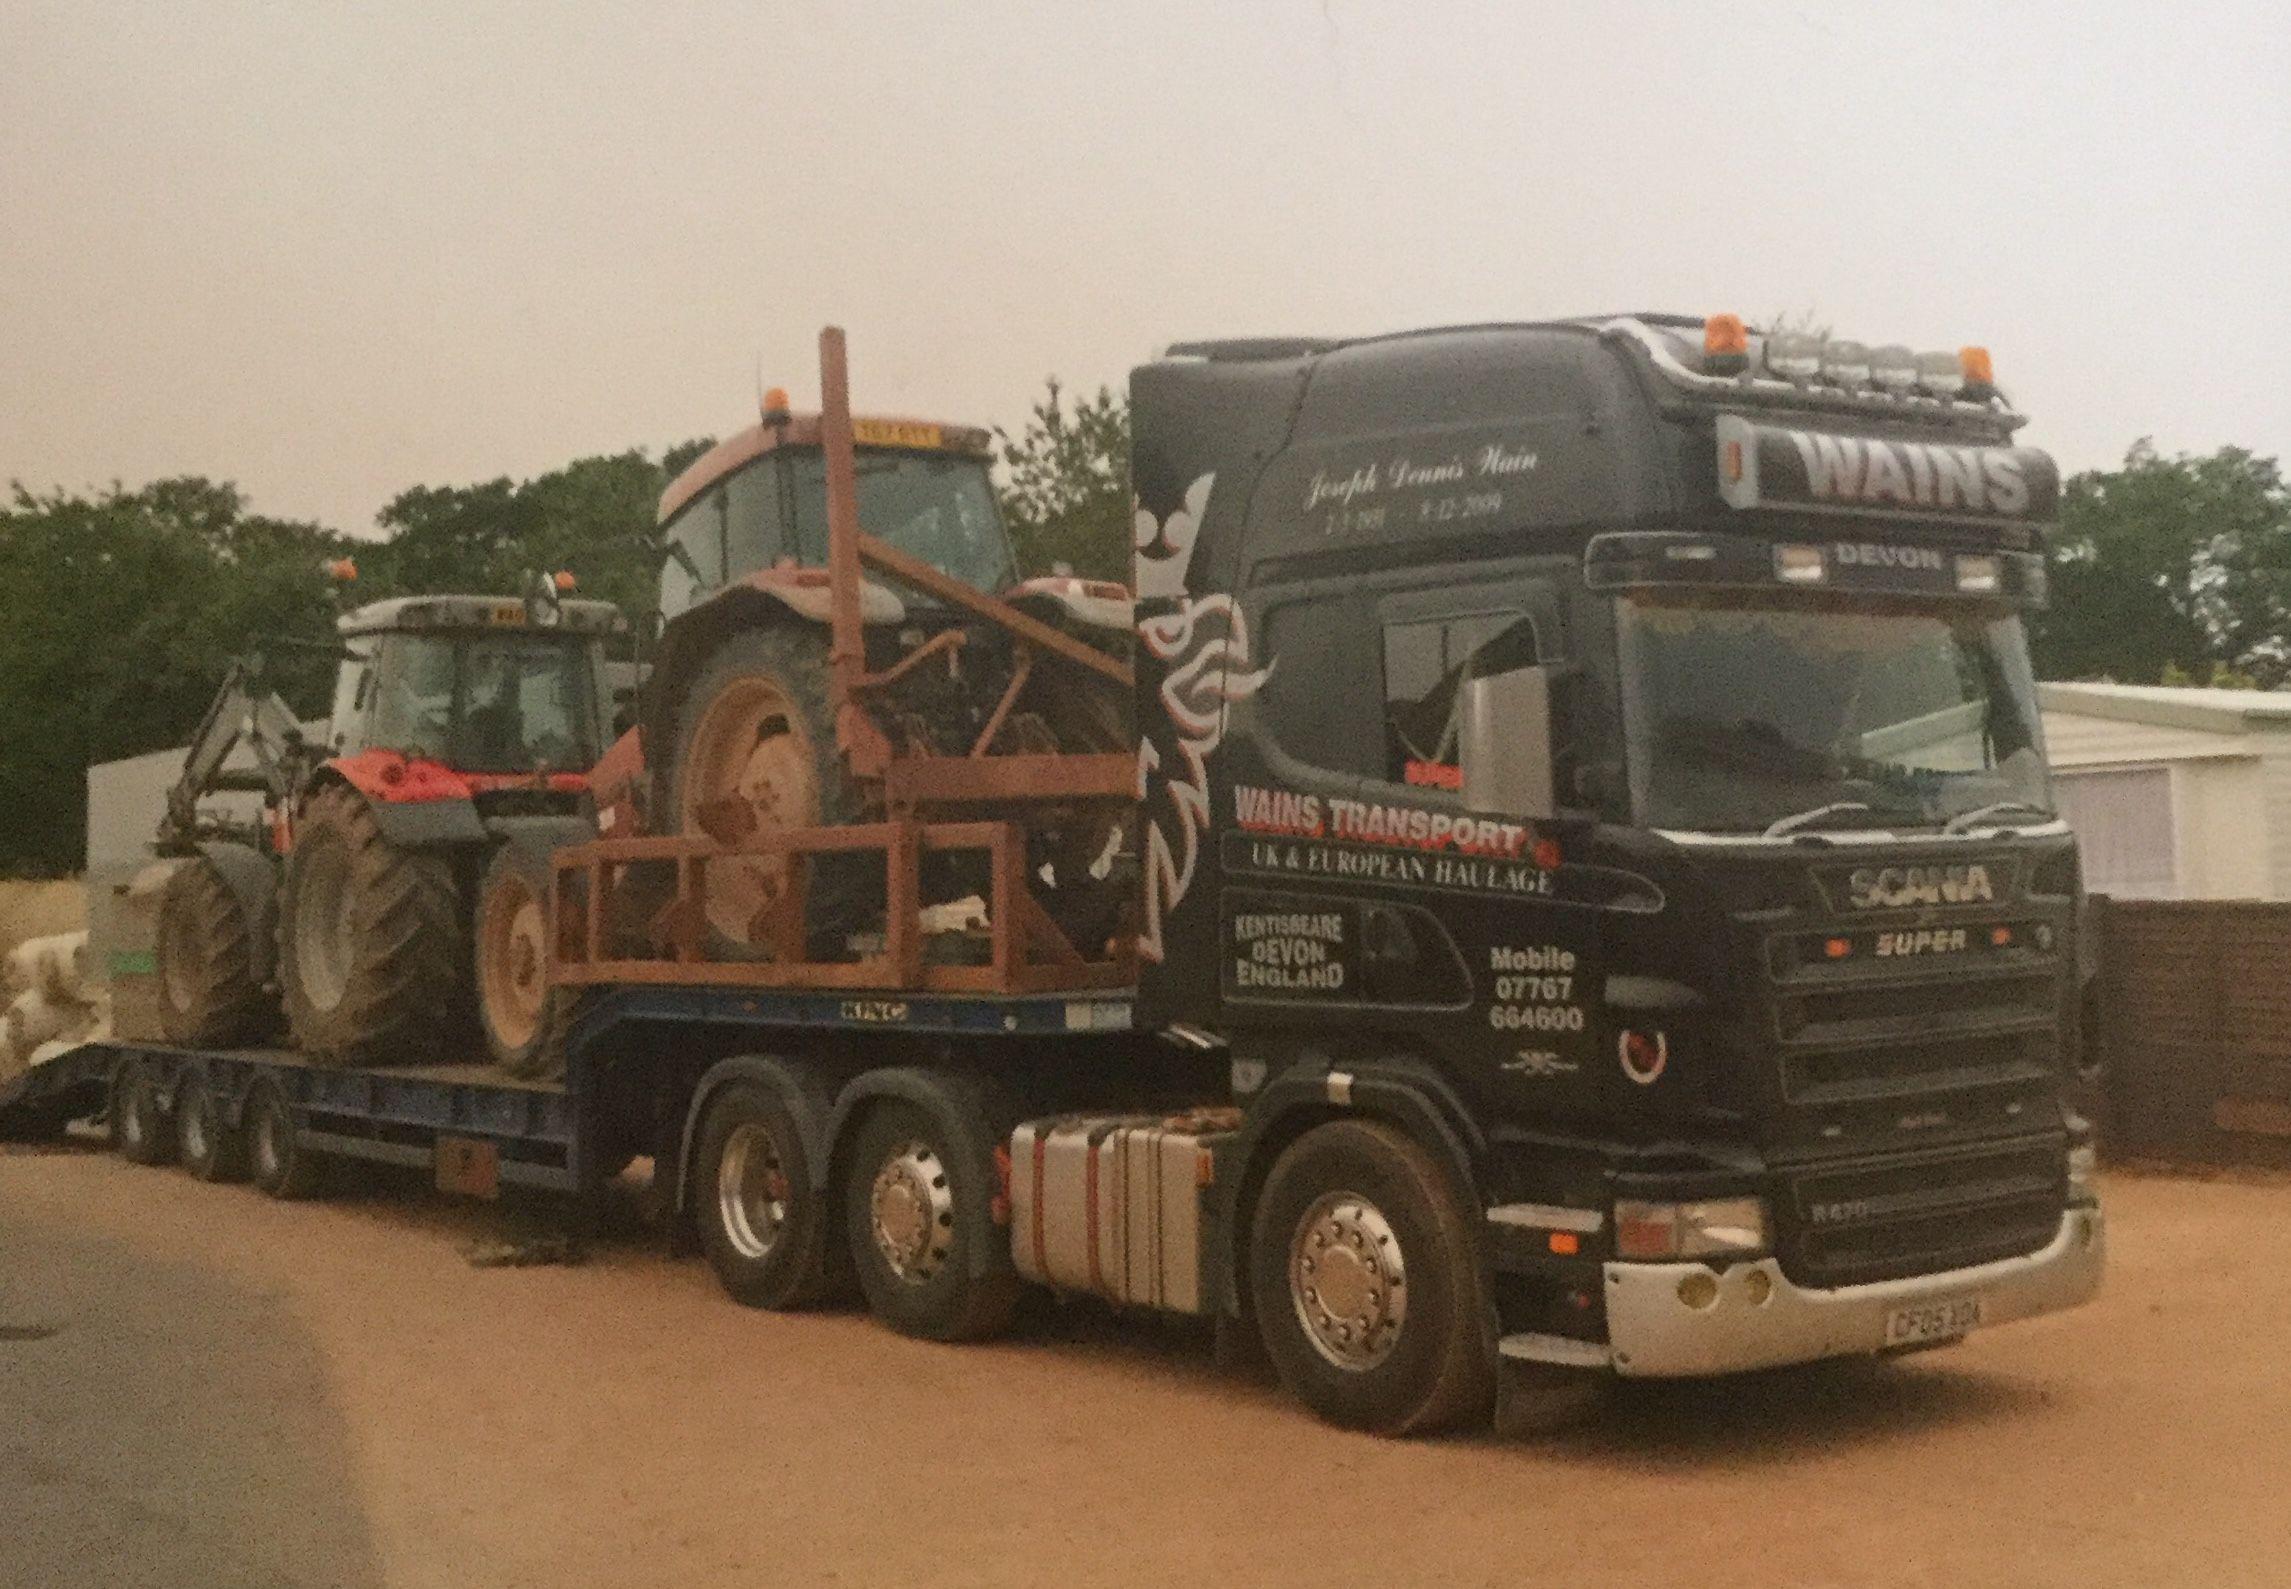 Pin de JWPfavouritetruckphotos em Wains Transport Scania